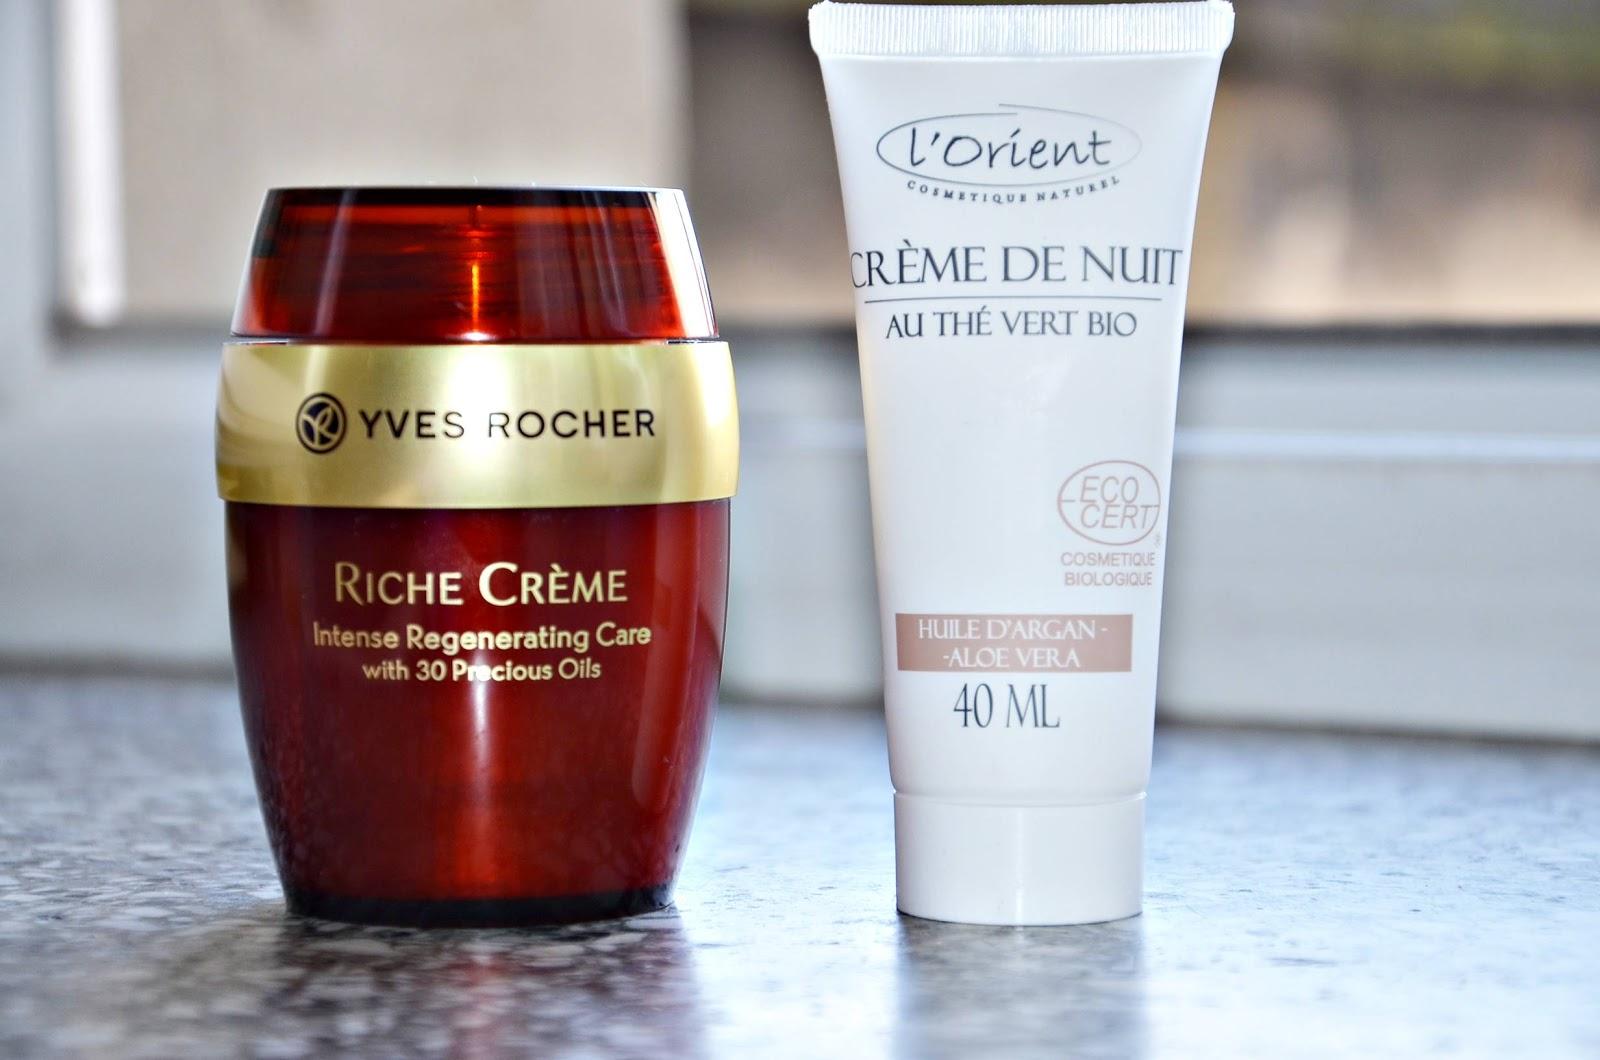 Kem dưỡng Yves Rocher Chăm sóc da Intense Regenerating Care